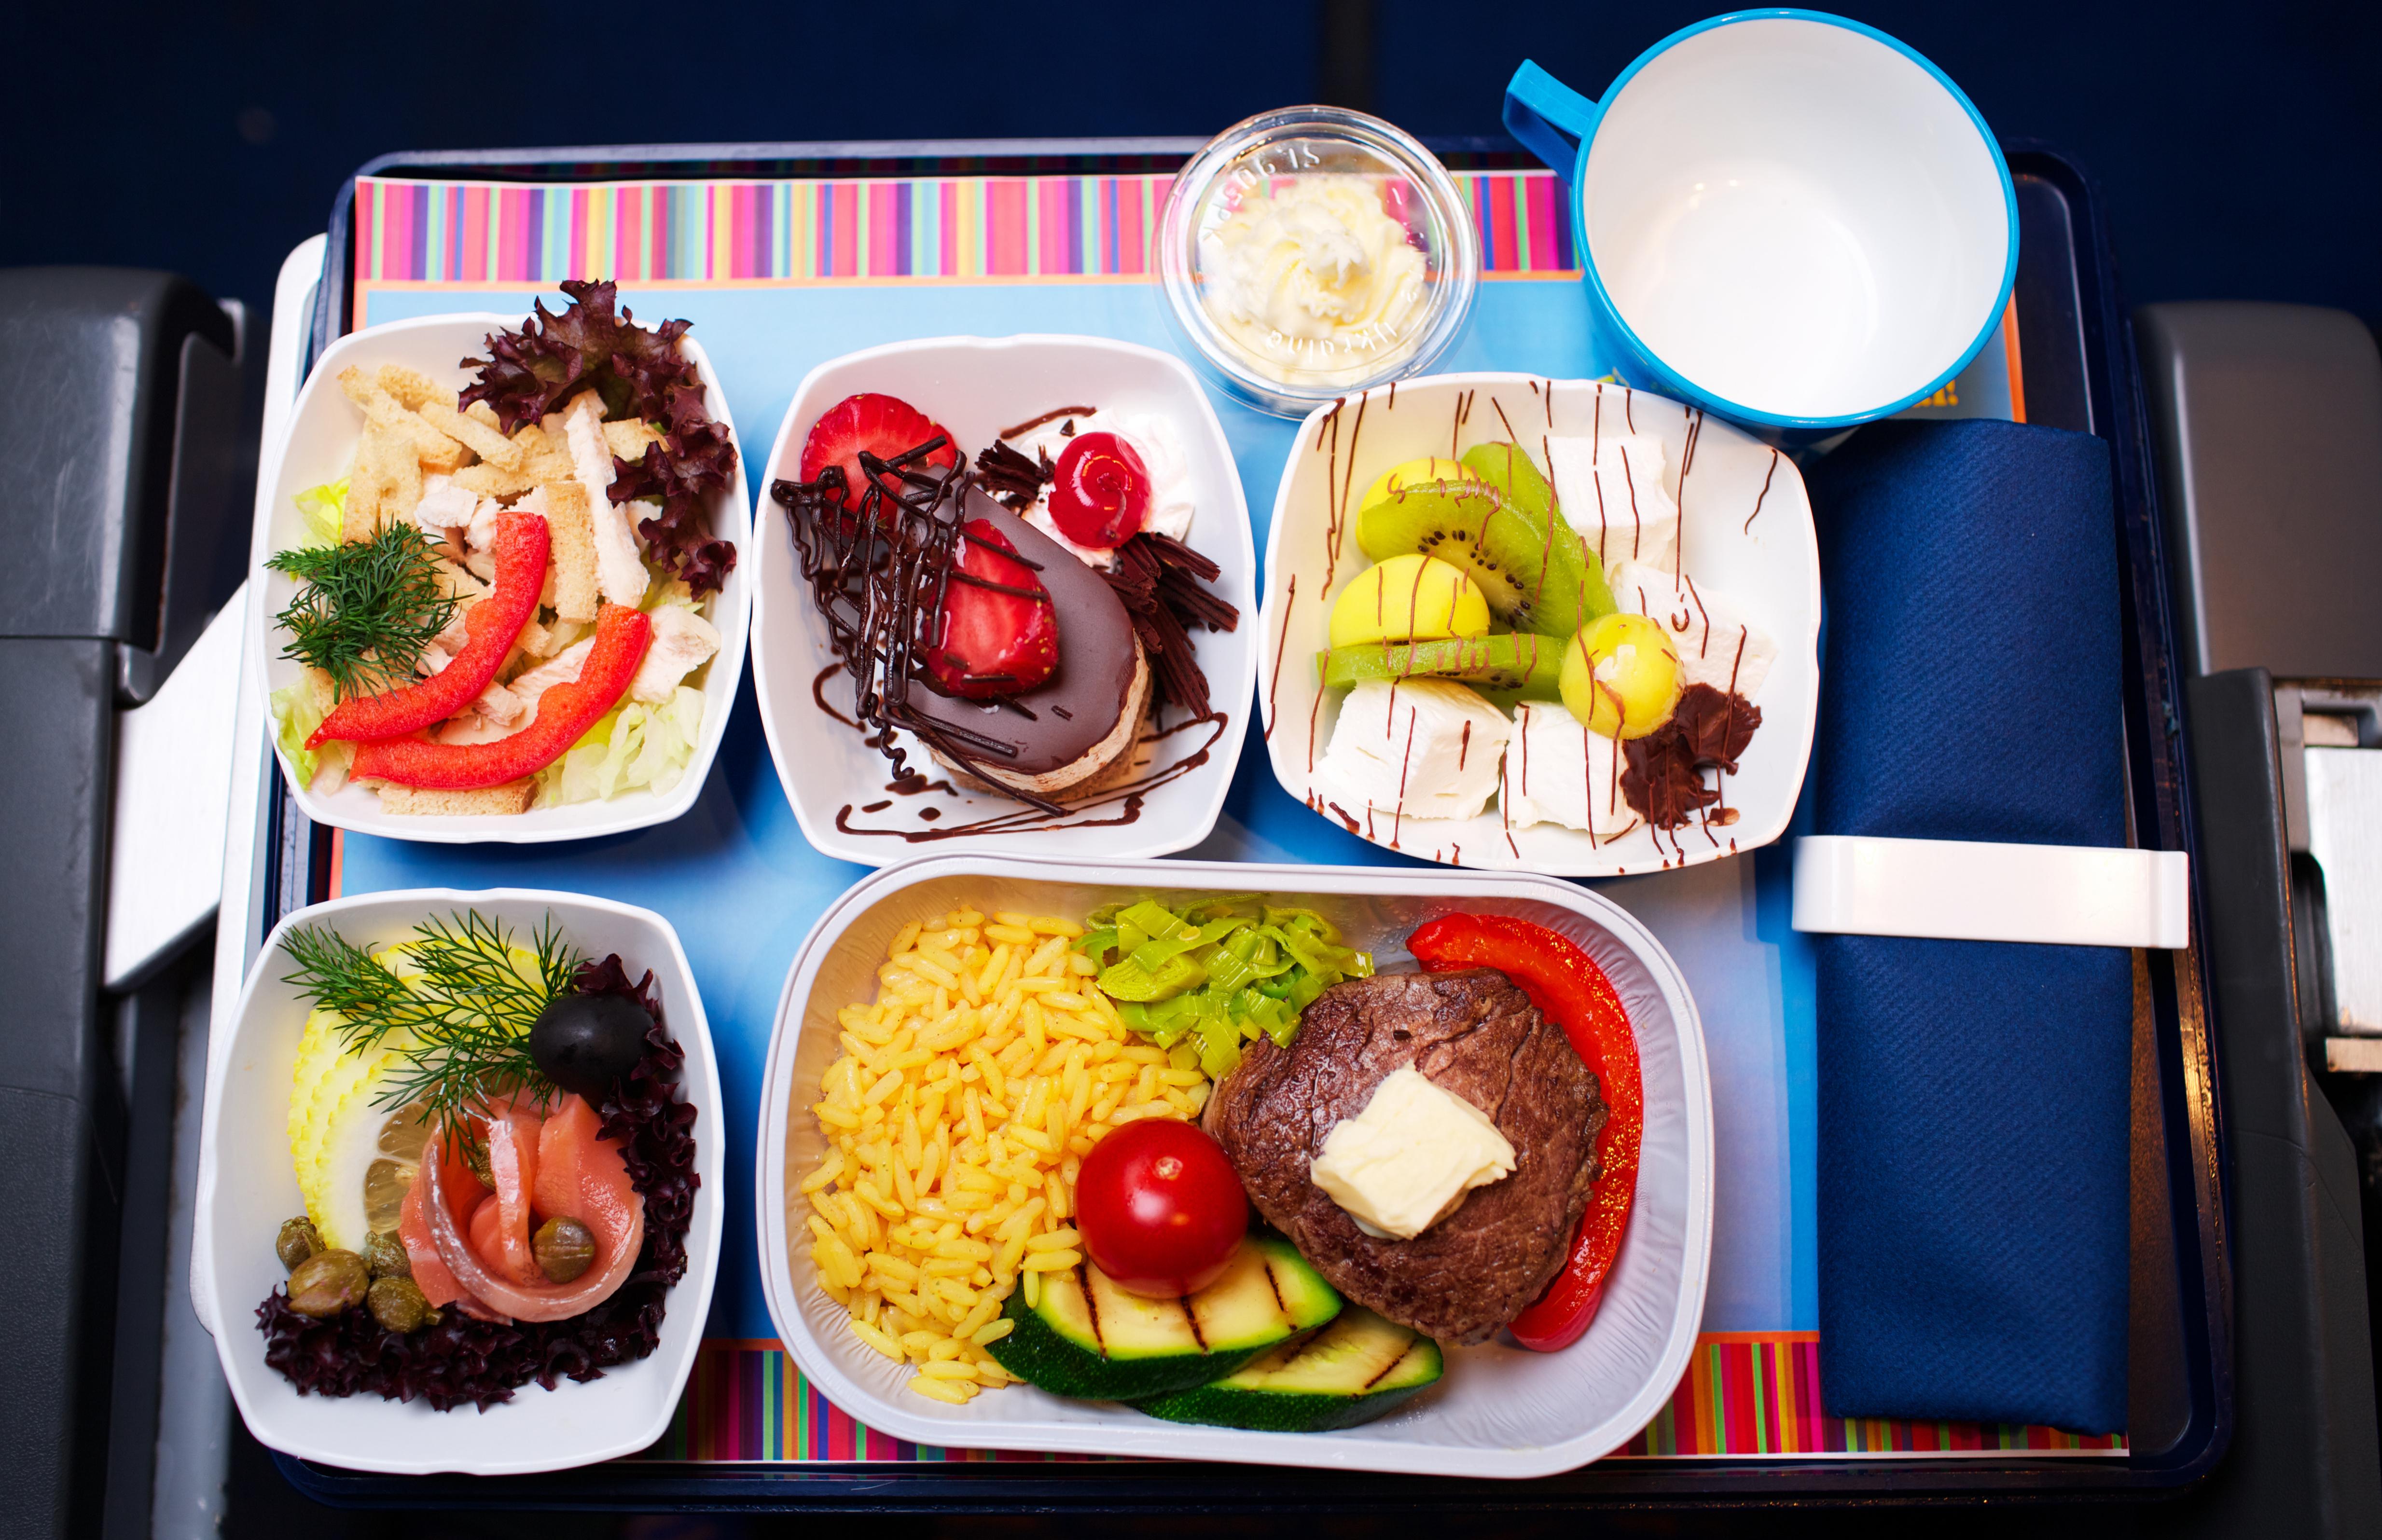 Tray of food on the plane Shutterstock/ StudioSmart